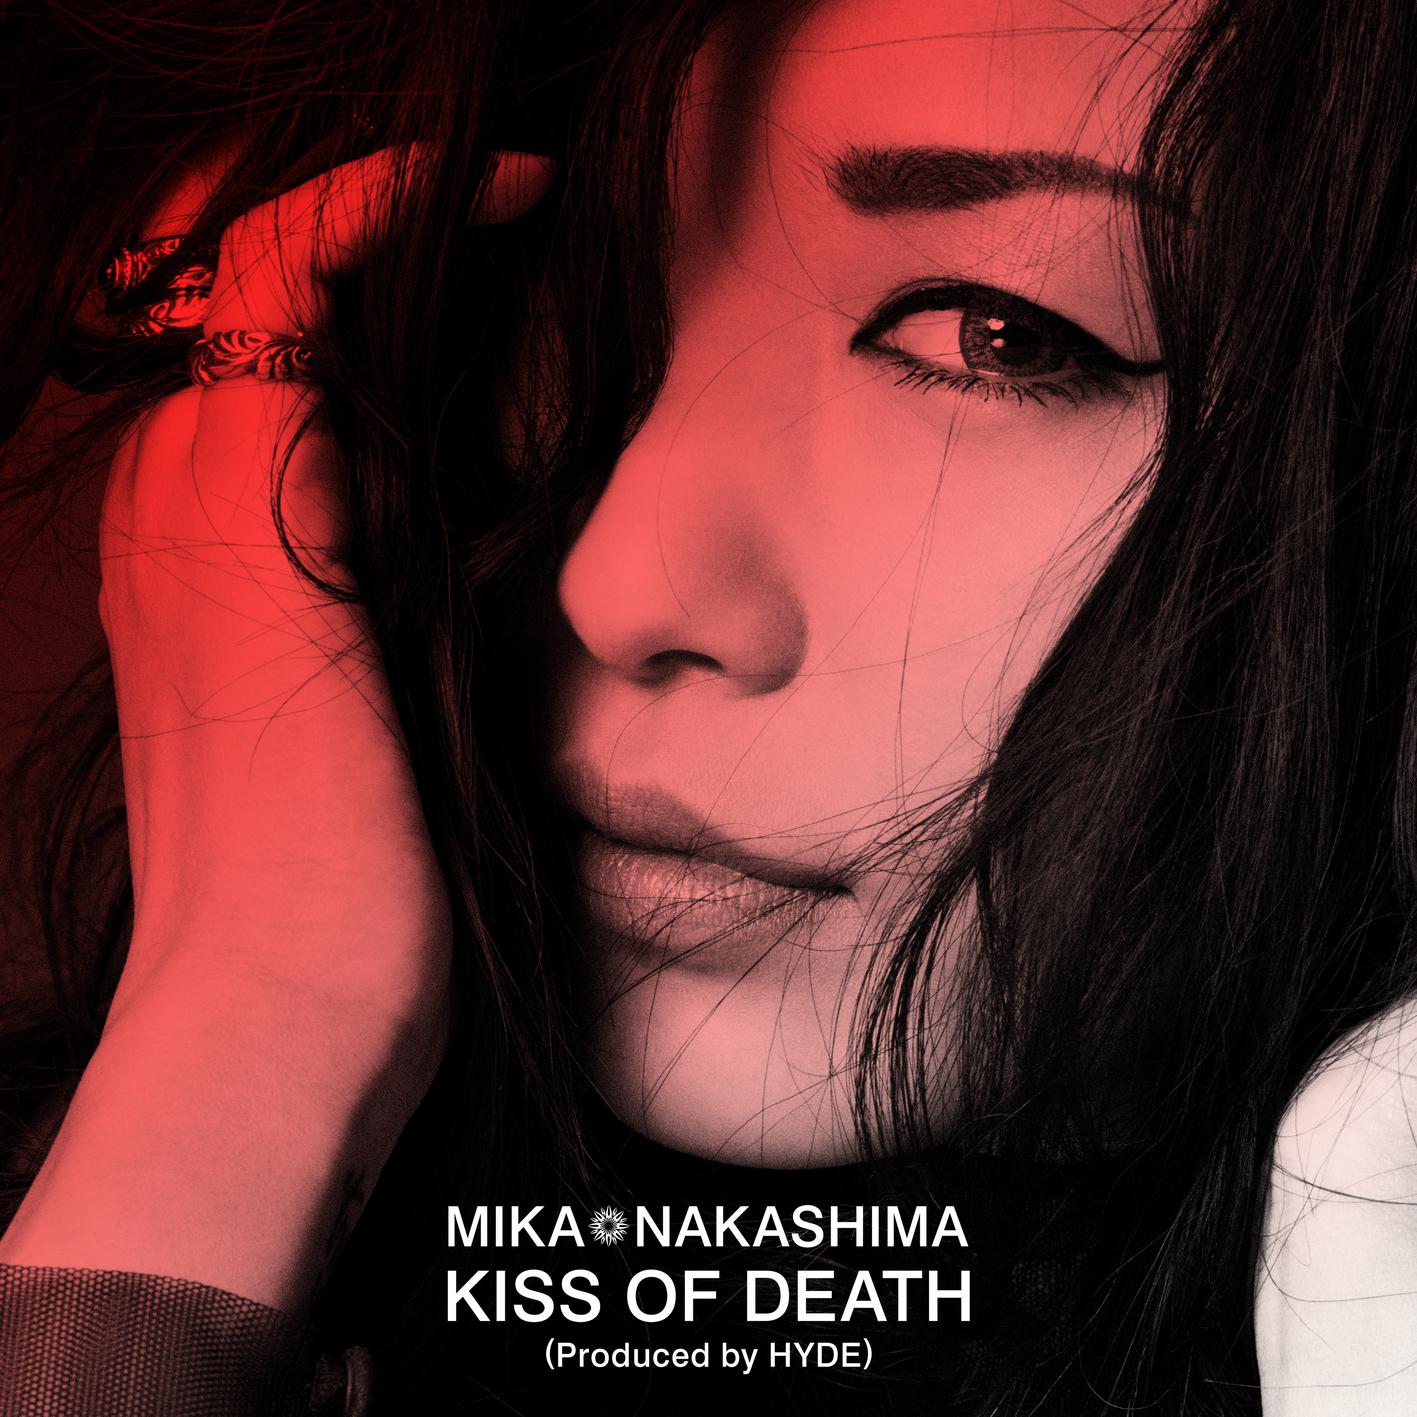 20180126.0625.5 Mika Nakashima - Kiss of Death (digital single) cover.jpg